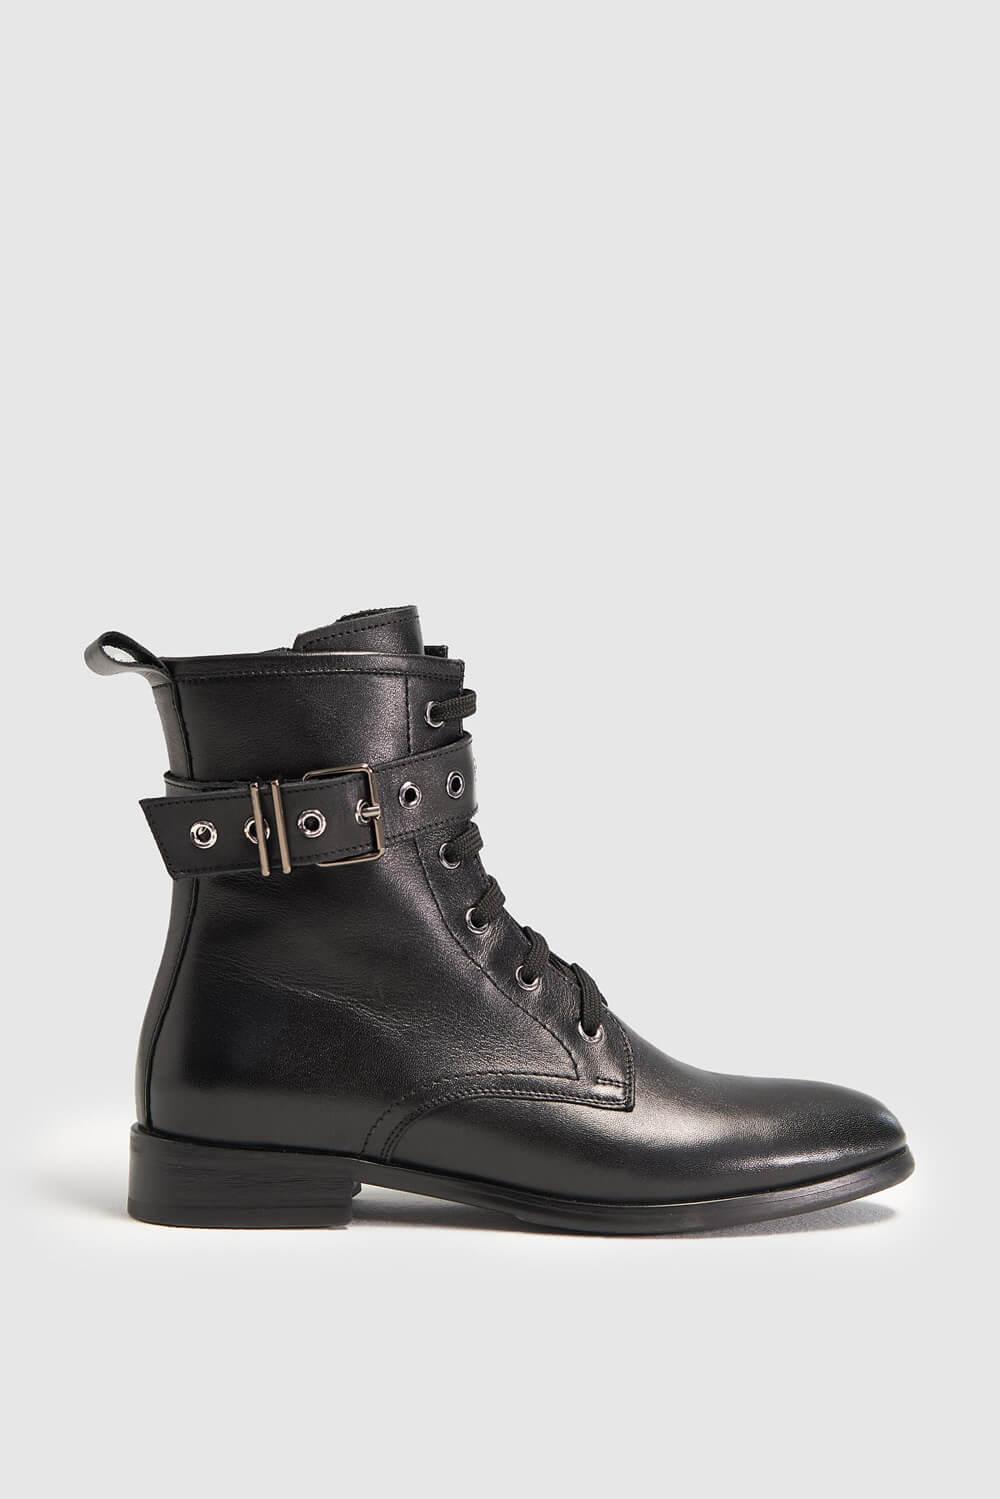 Ботинки для женщин Natali Bolgar BT003KJN1 размеры обуви, 2017